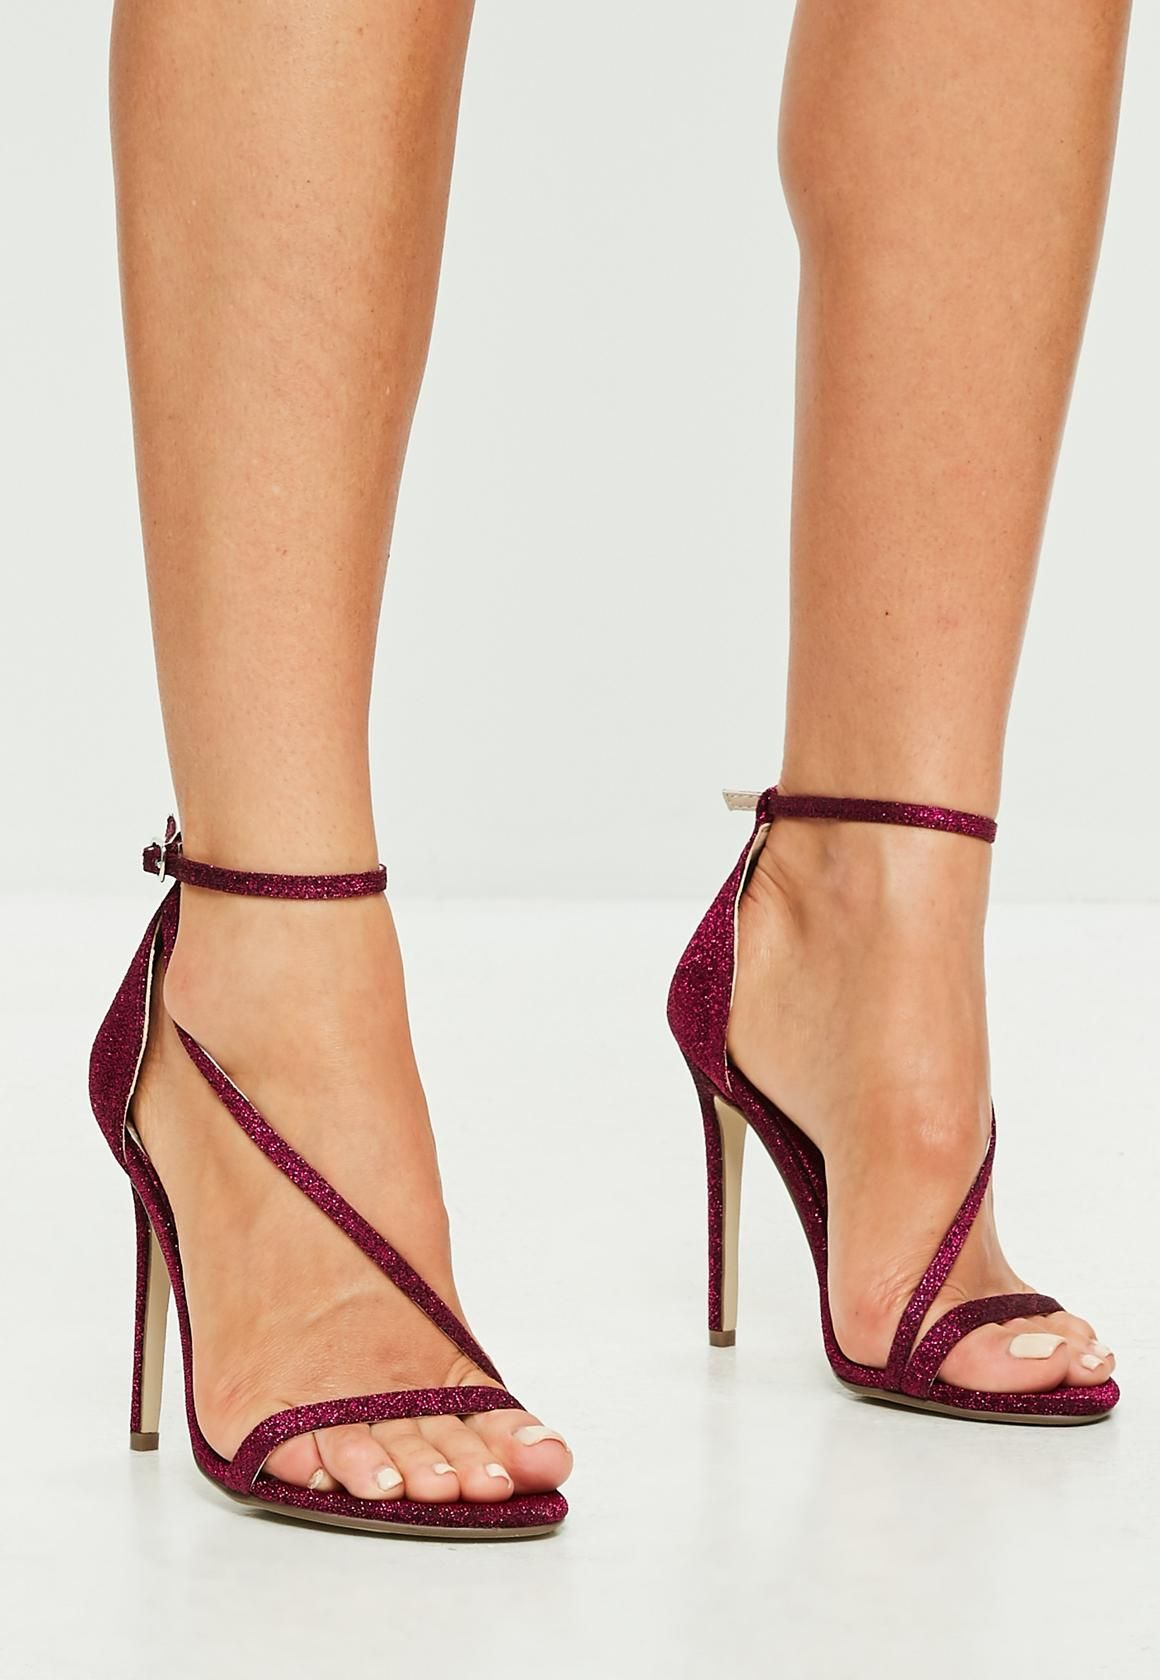 aa1bba73e97 Missguided - burgundy glitter asymmetric barely there sandal heels ...